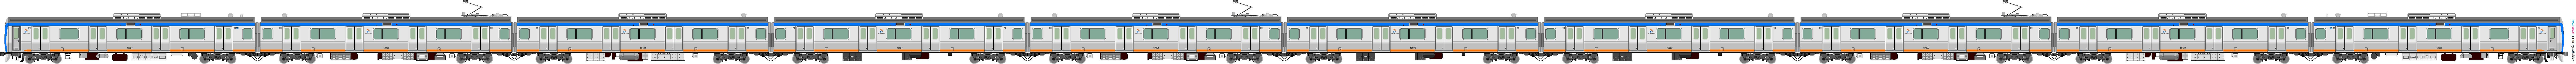 Train 5593